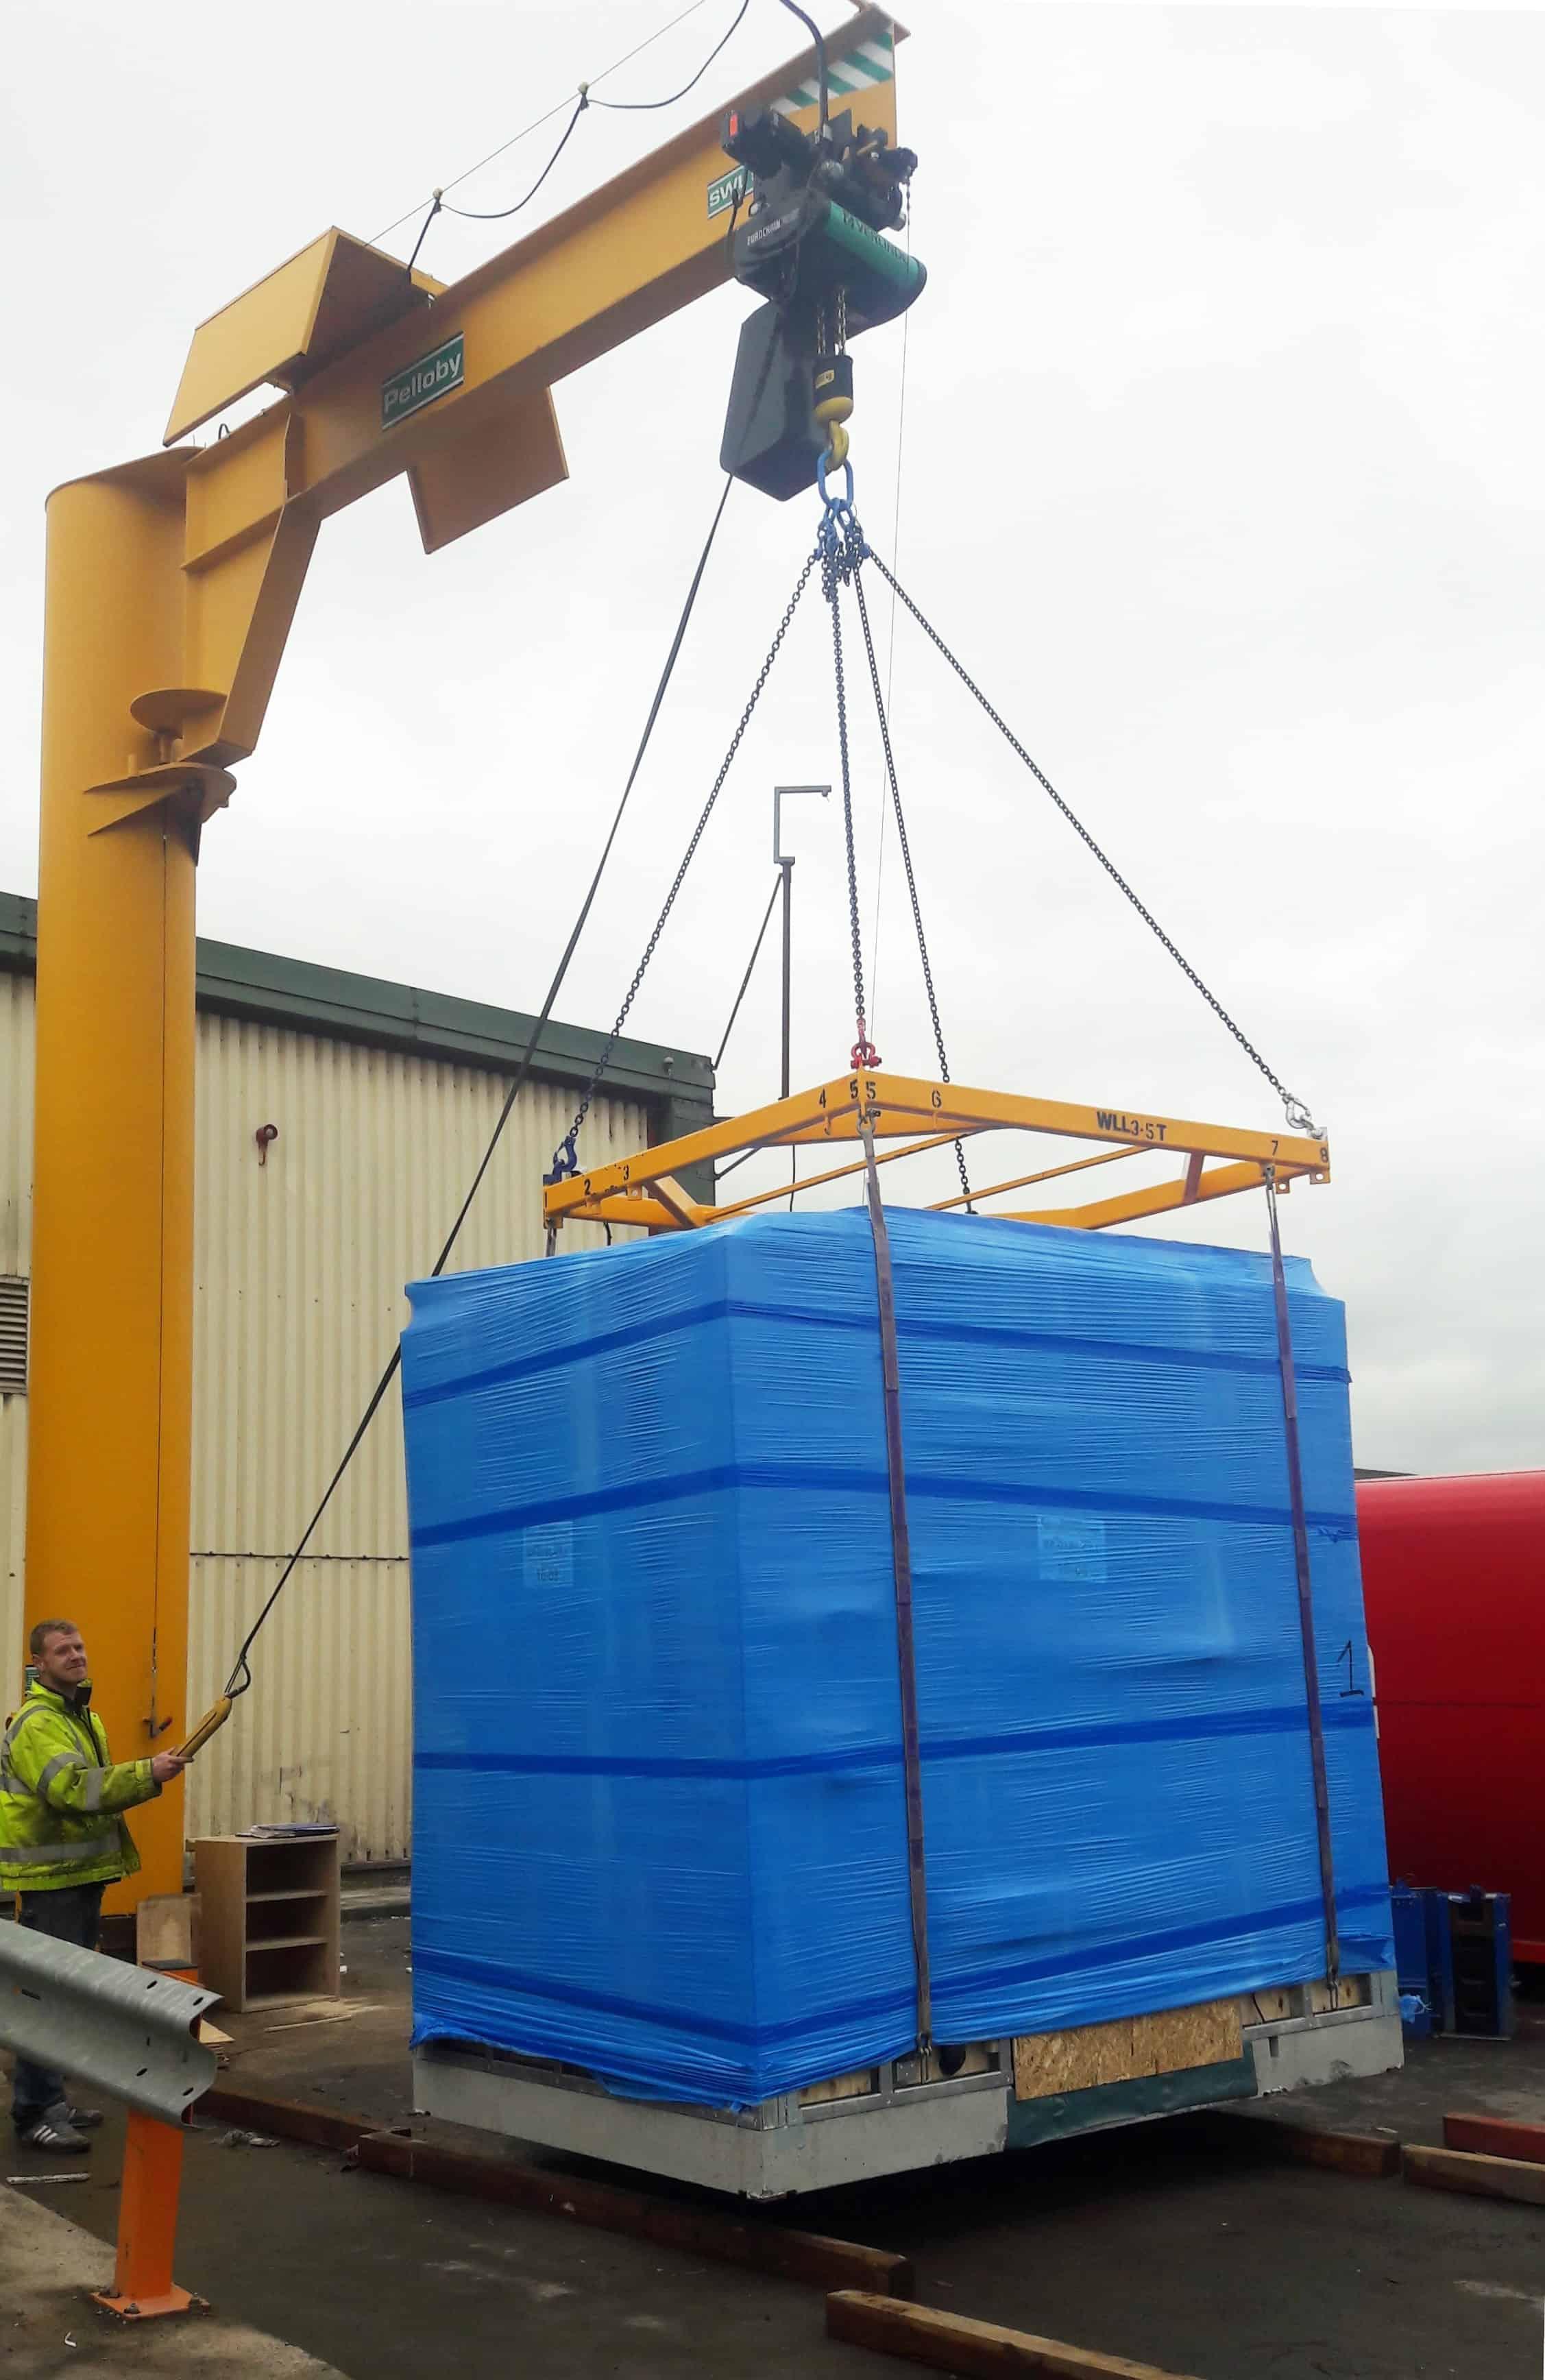 Five Tonne Jib Crane Lifting Pod